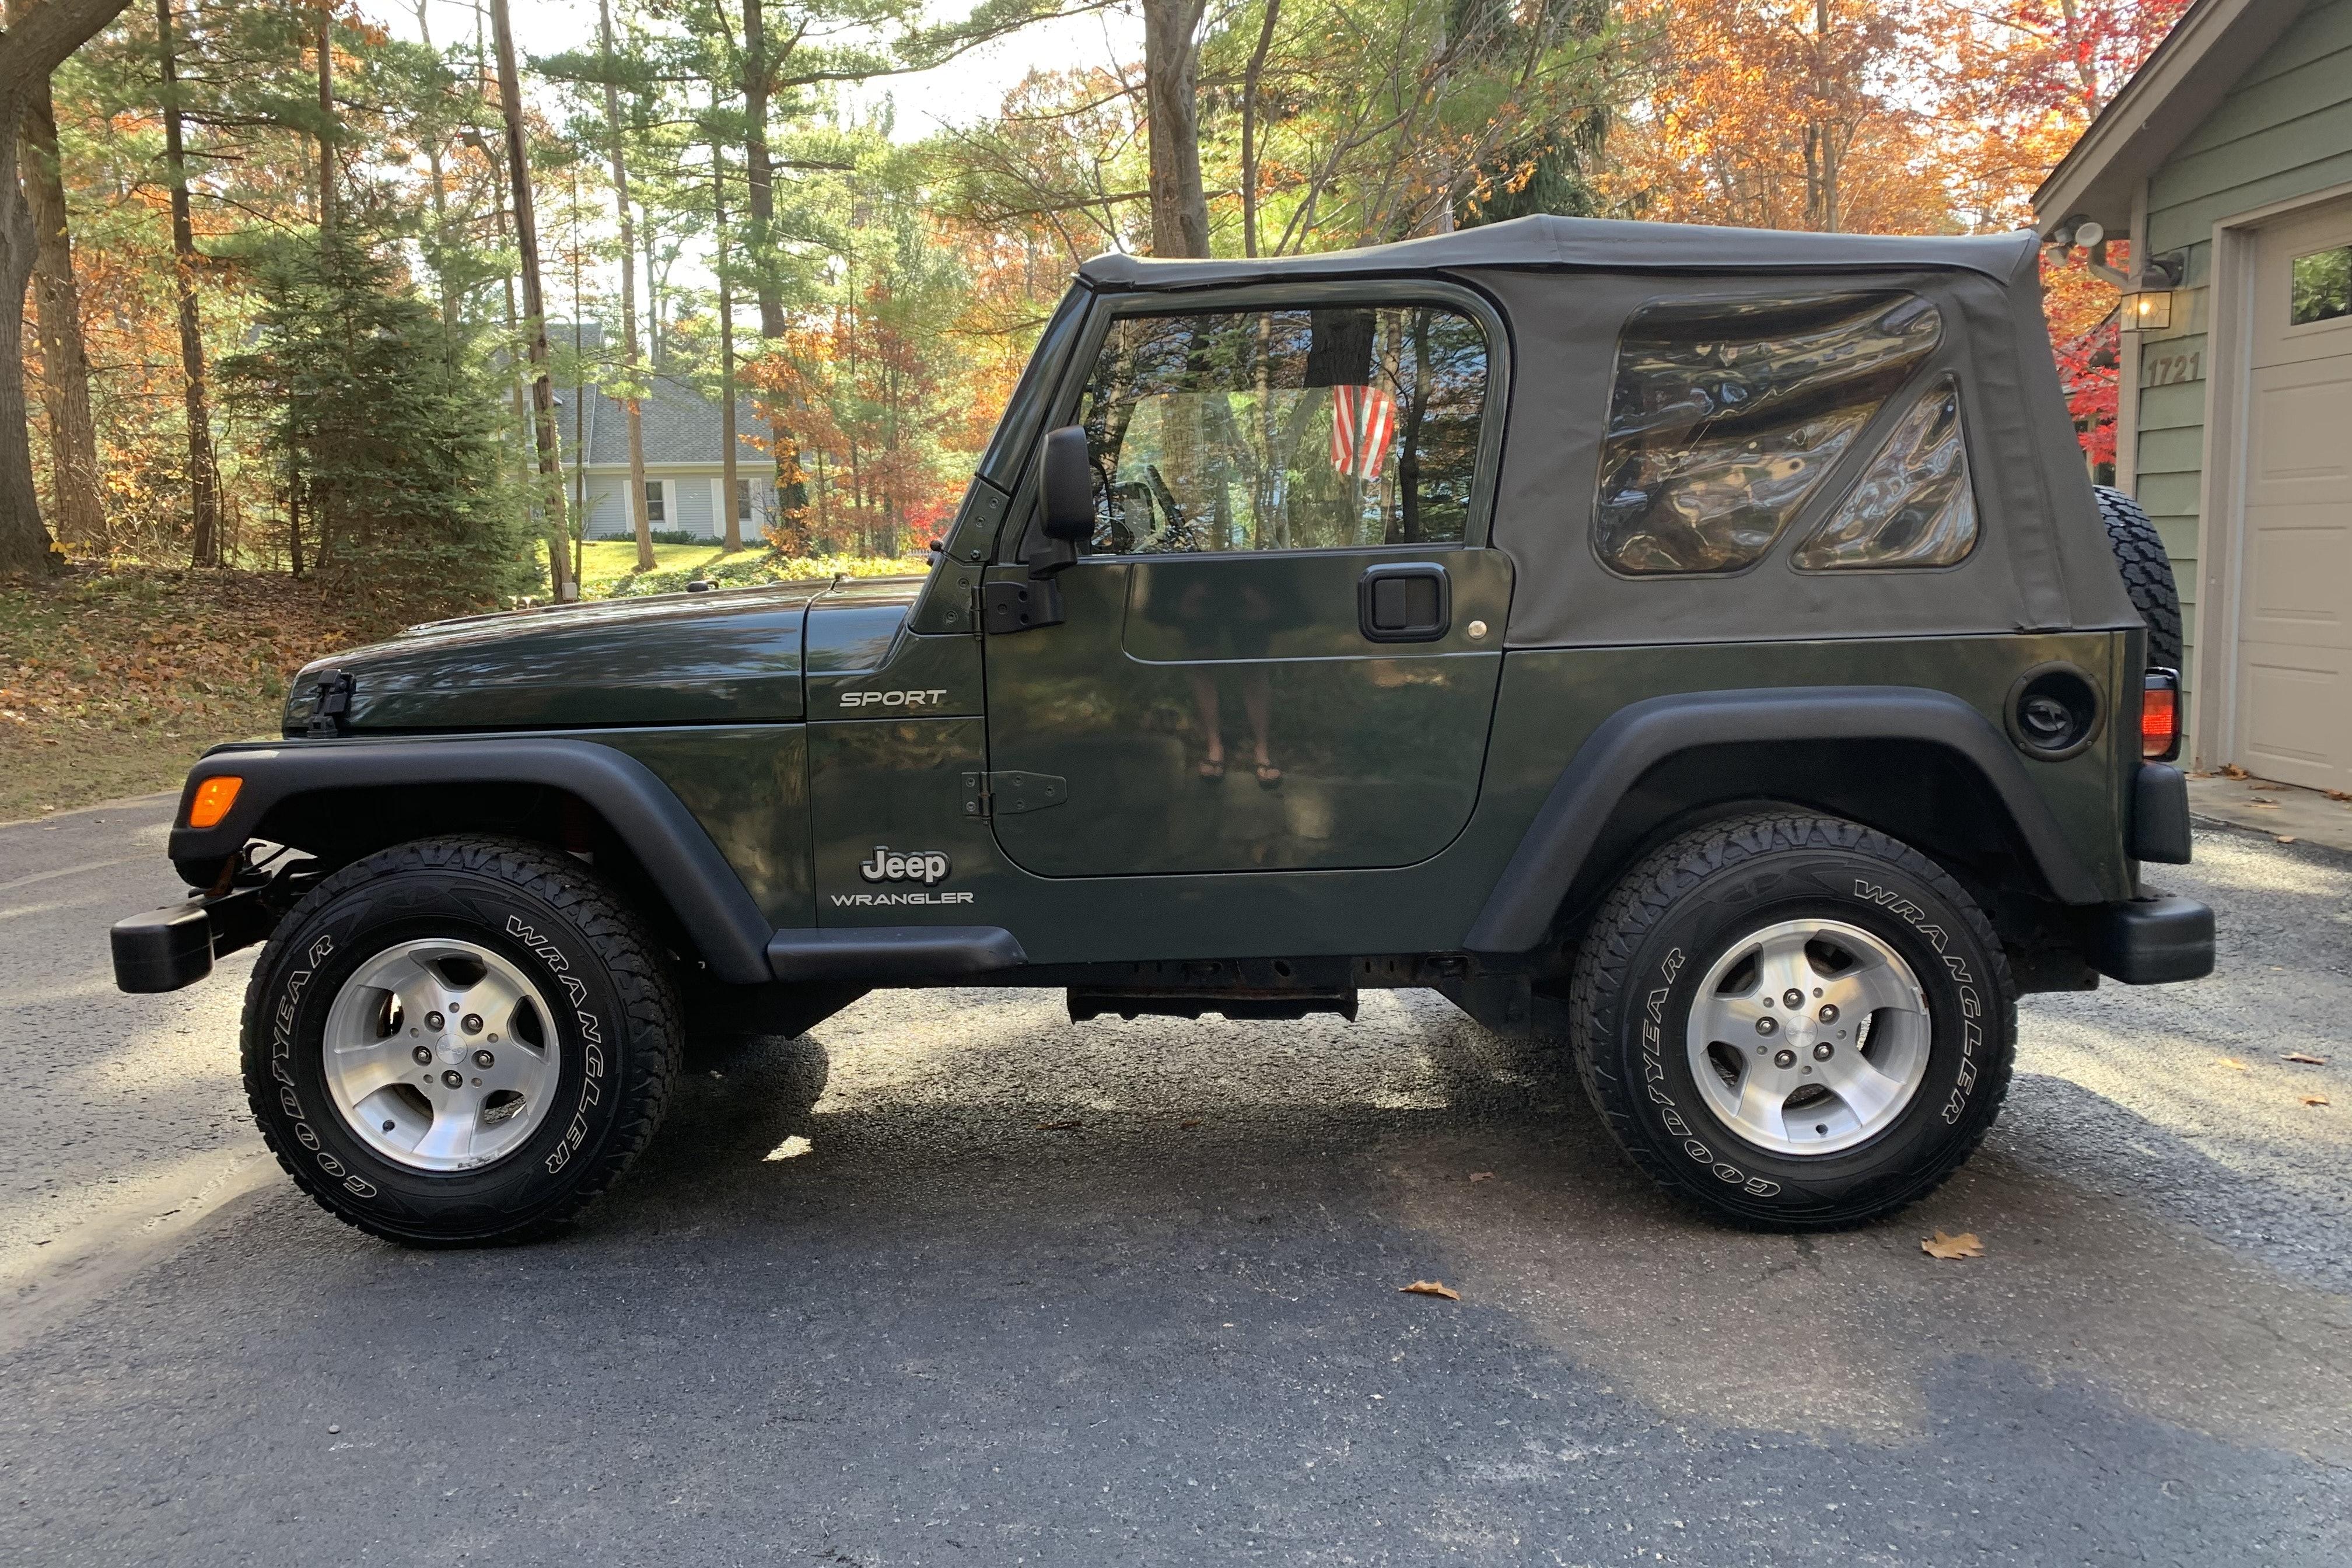 2003 Jeep Wrangler (TJ)